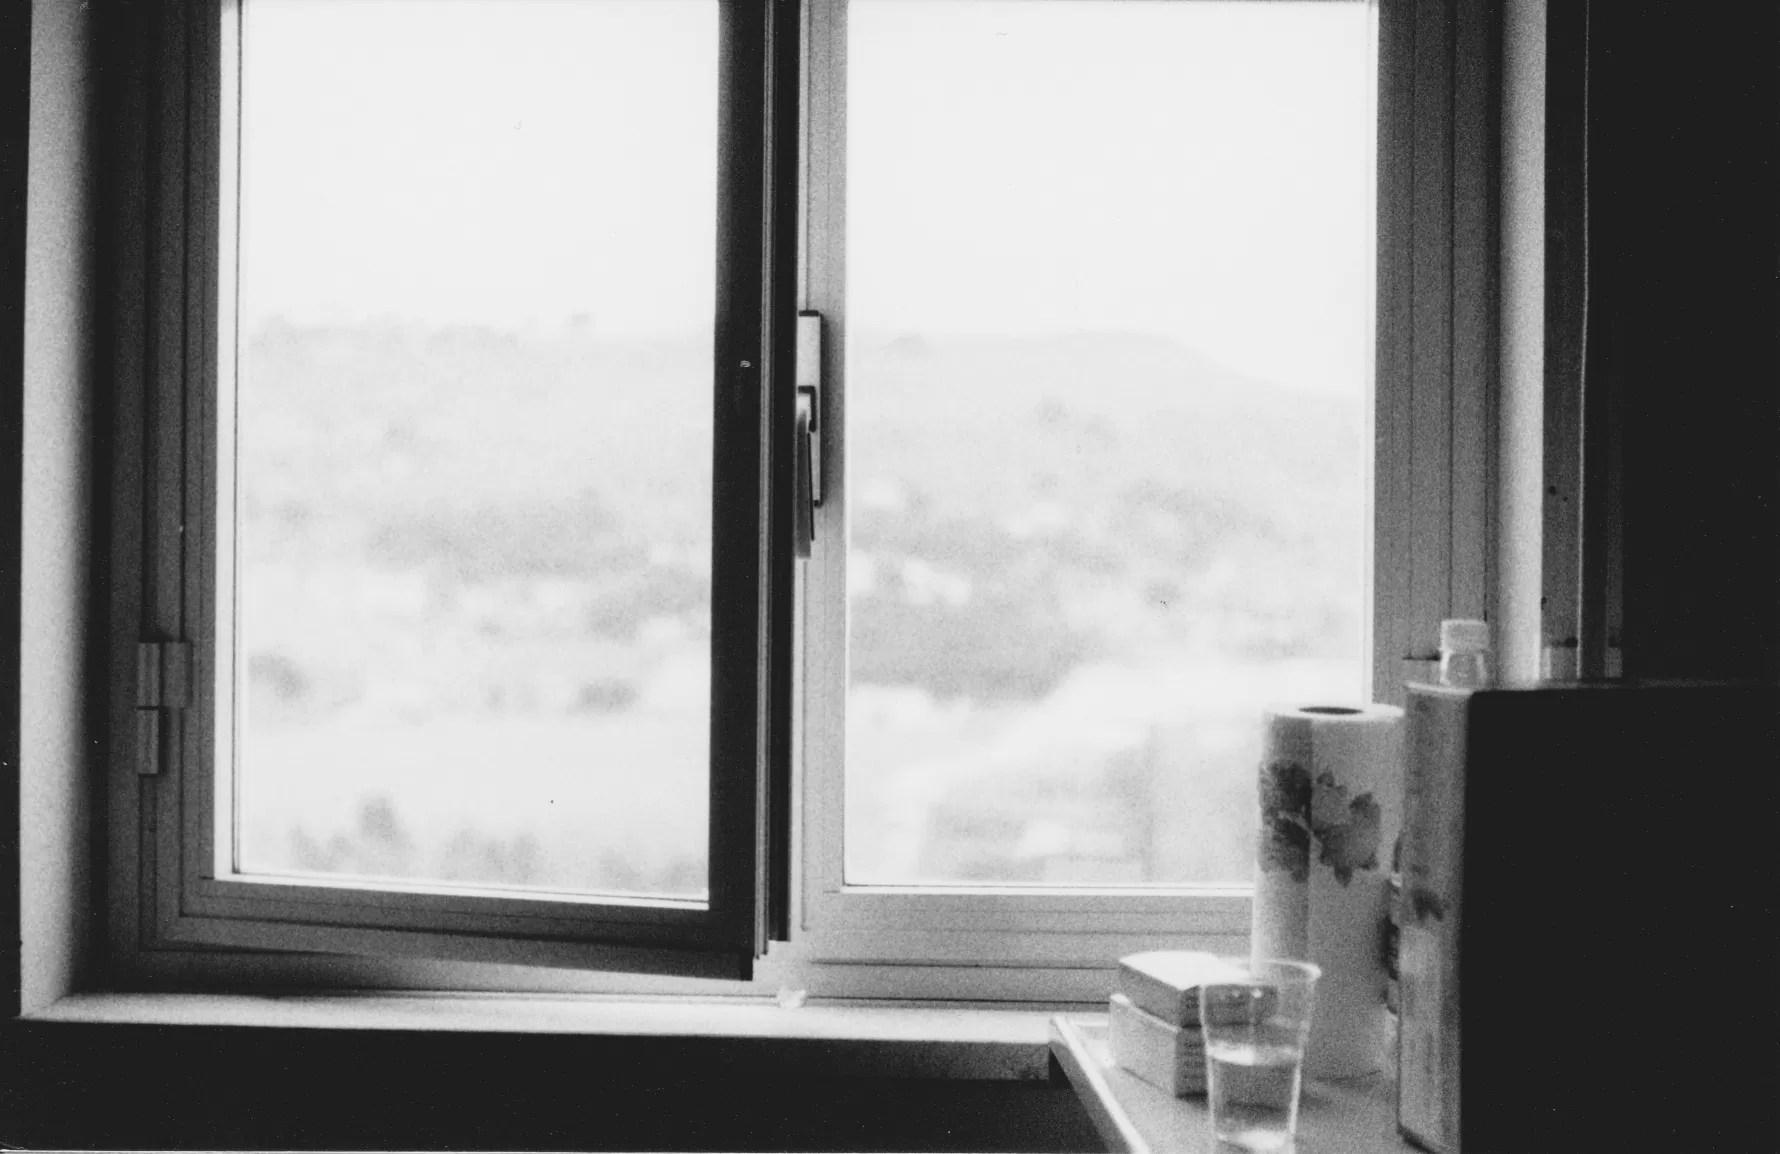 kentmere 2 - Kentmere 400 bianco e nero dai toni vintage - fotostreet.it